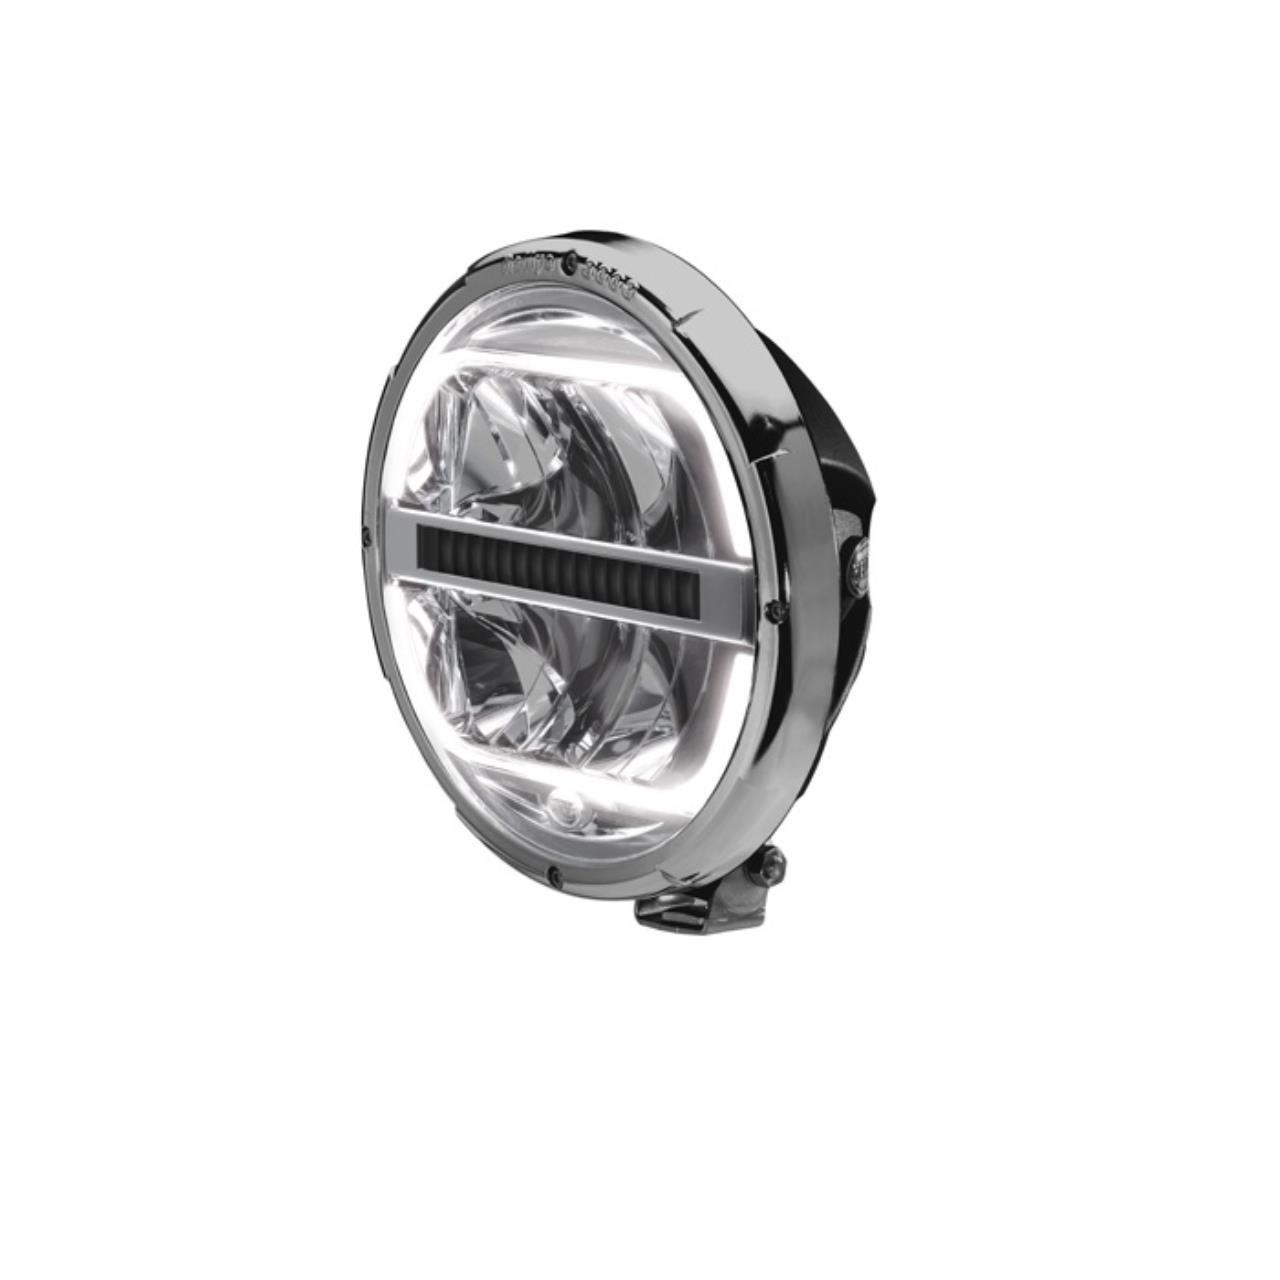 Hella Rallye 3003 LED Fjernlygte - ref. 50